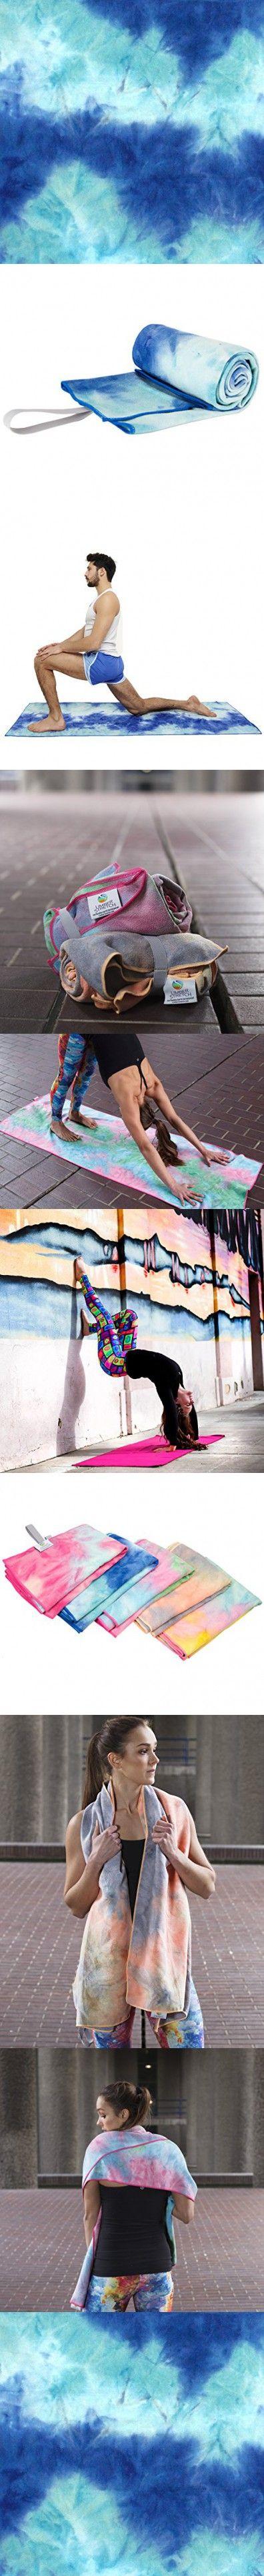 Limber Stretch Yoga Mat towel - Microfiber Bikram Hot Yoga Towel - Non Slip and Sweat Absorbent perfect for Bikram, Ashtanga, Vinyasa yoga